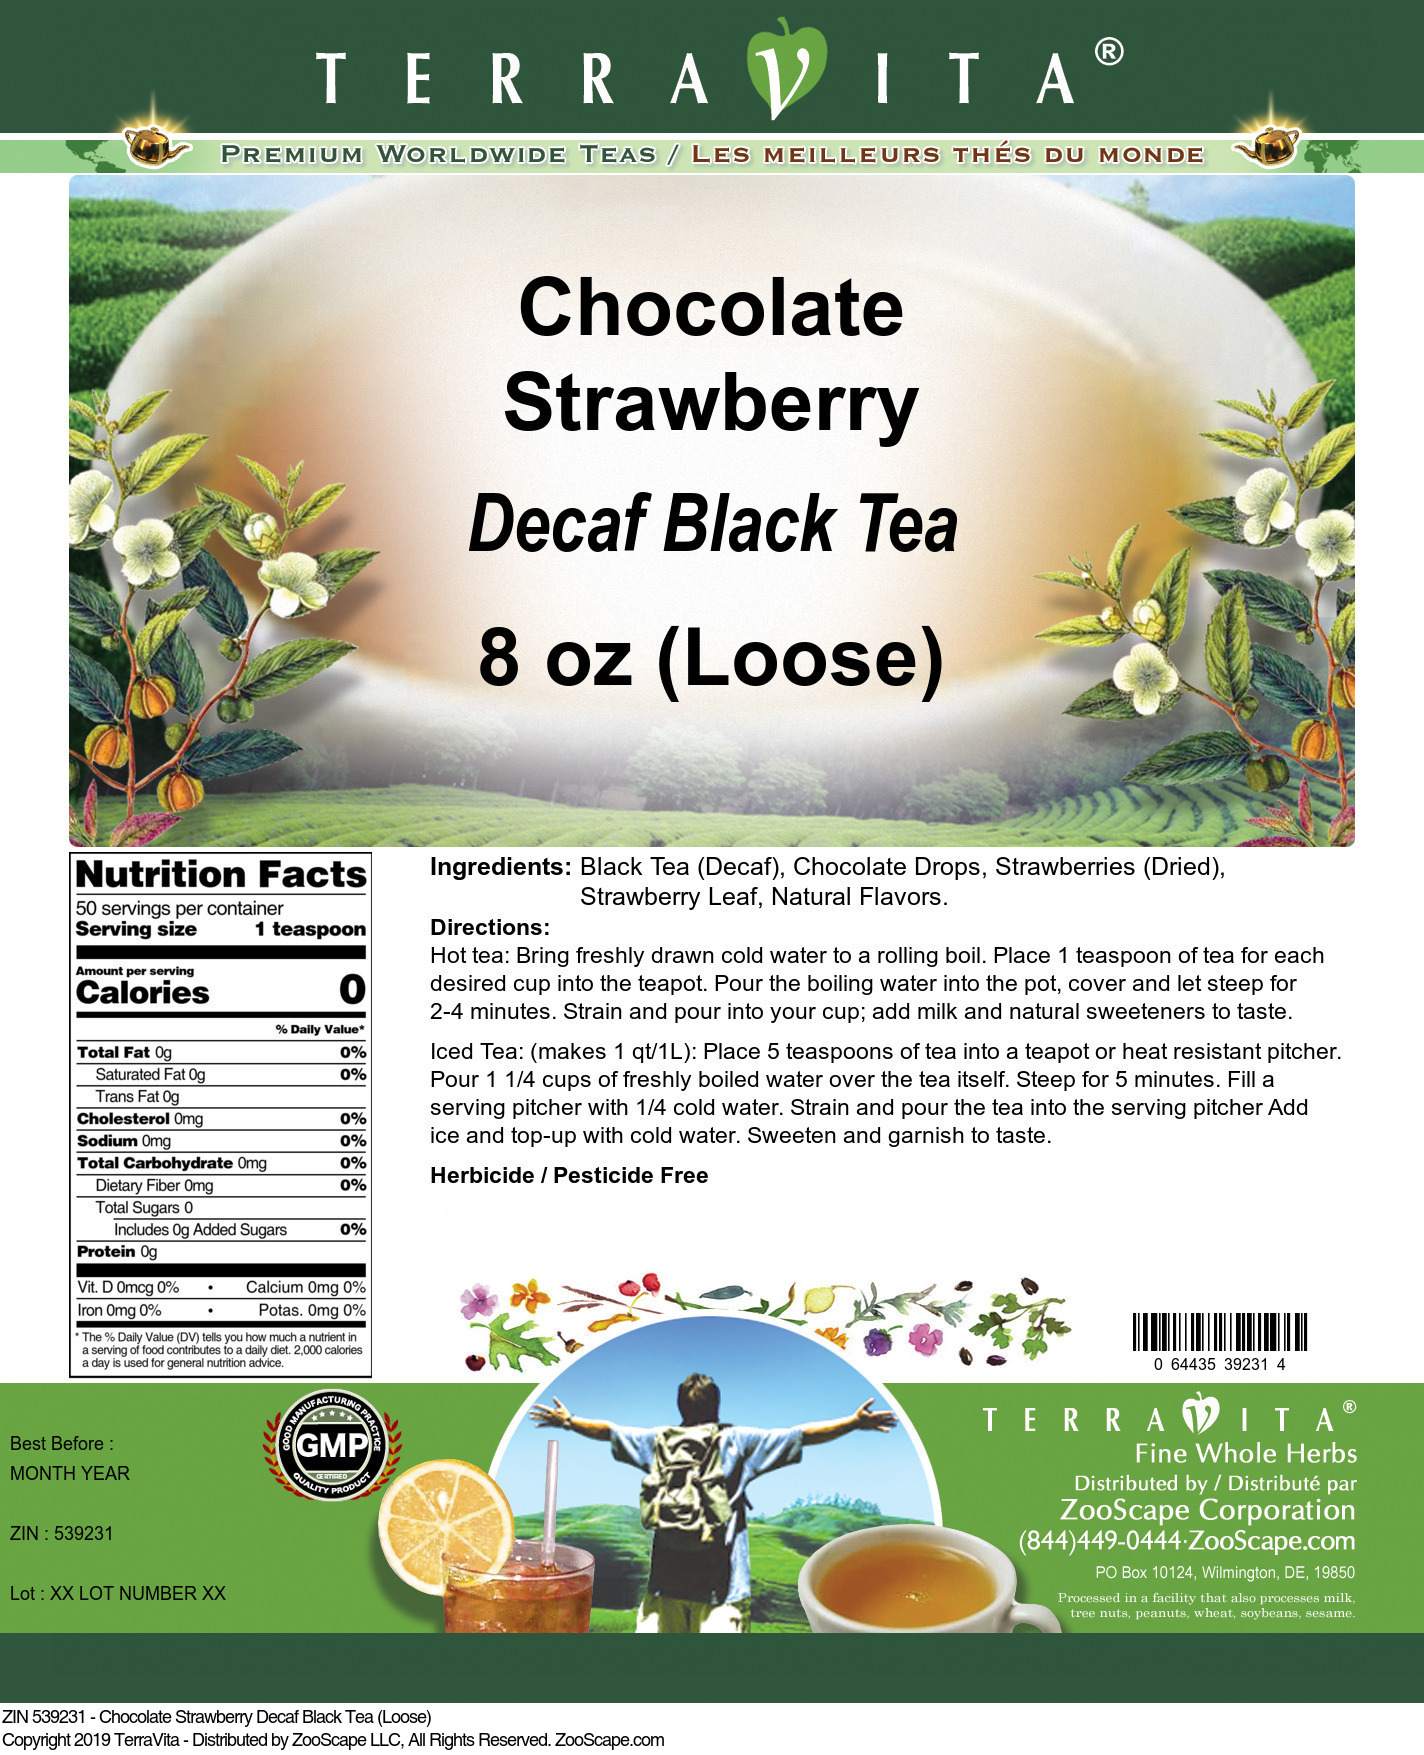 Chocolate Strawberry Decaf Black Tea (Loose)